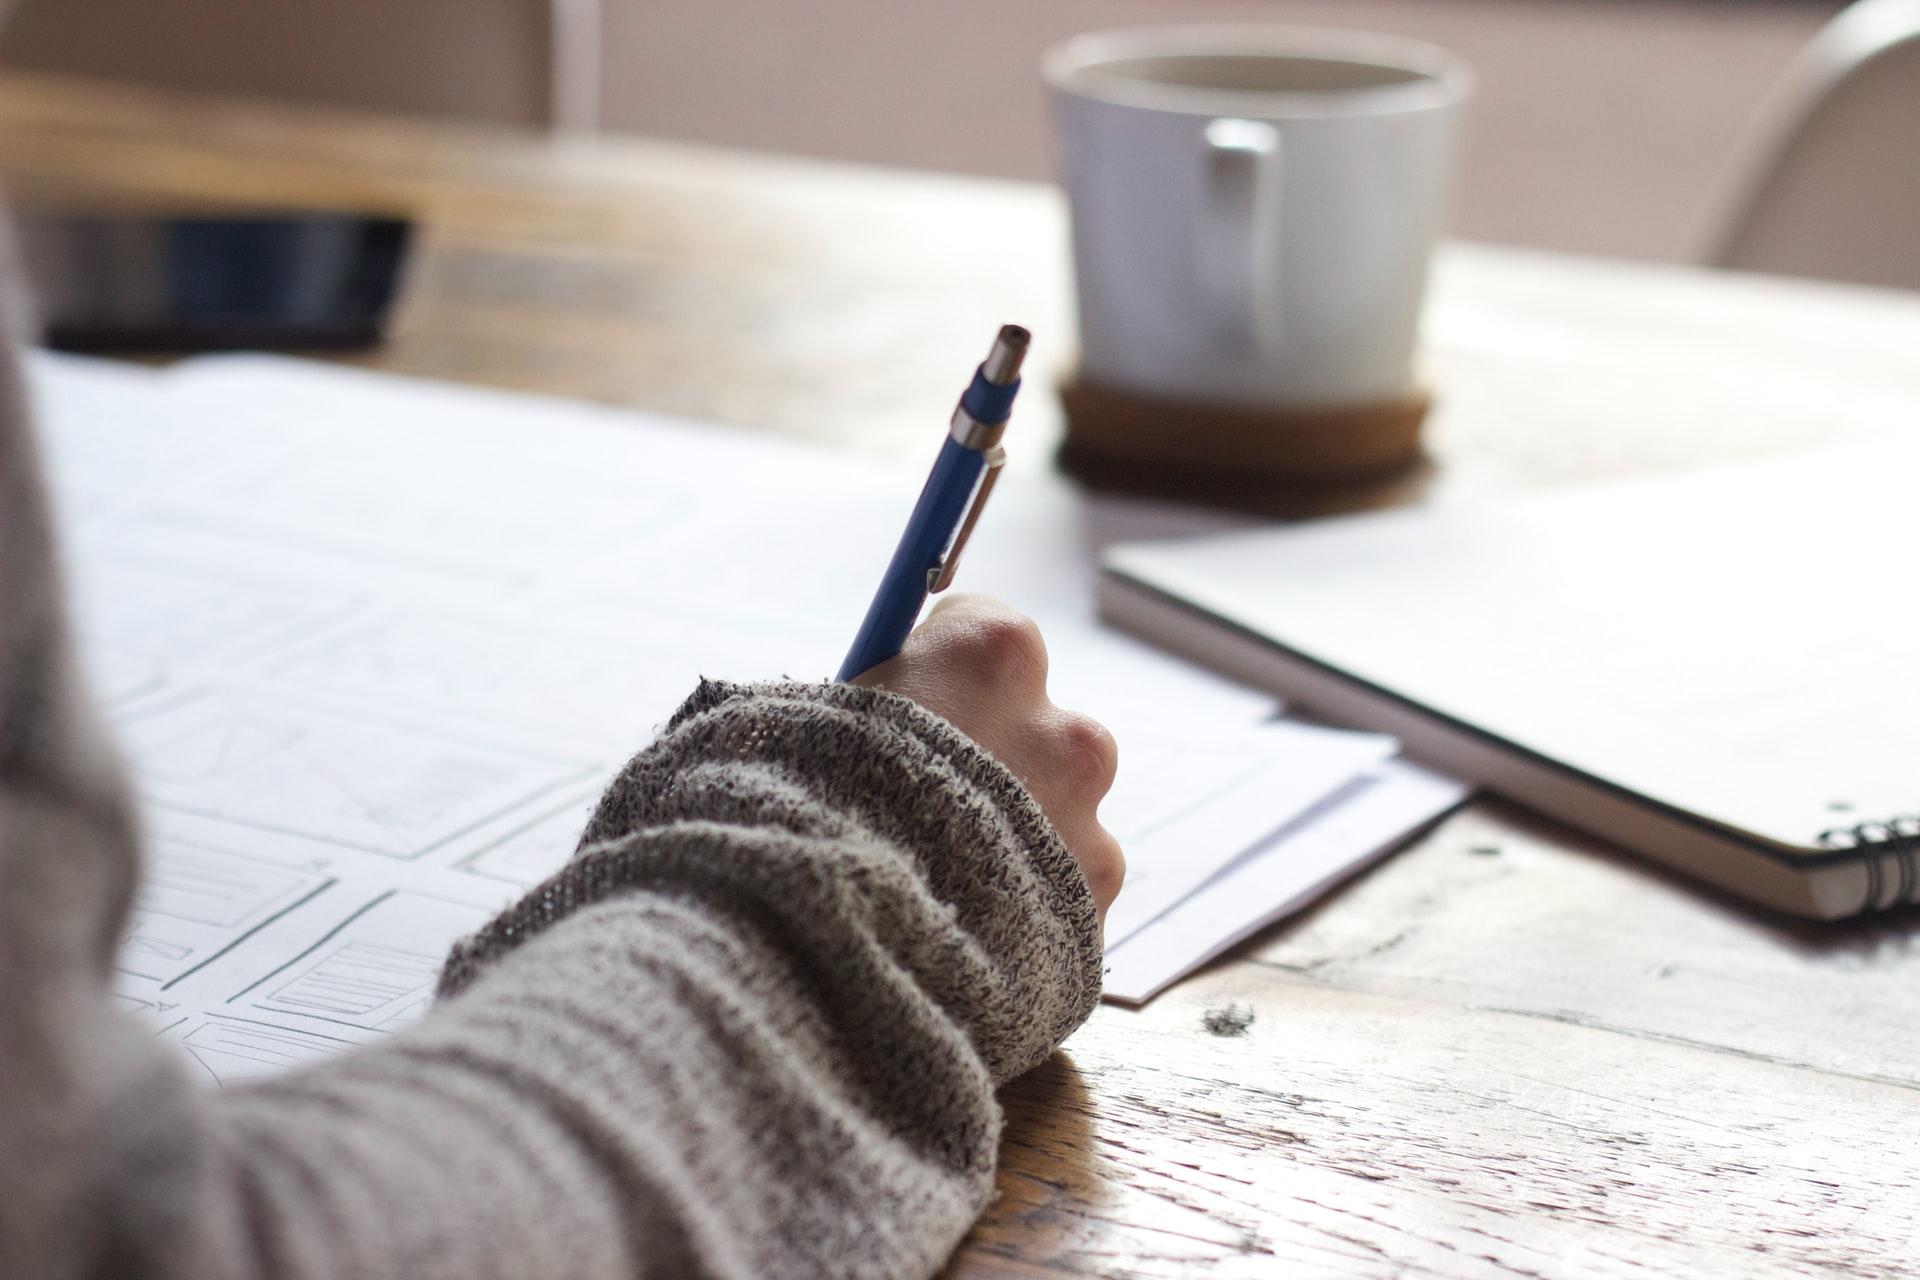 Writing. Photo by Green Chameleon on Unsplash.